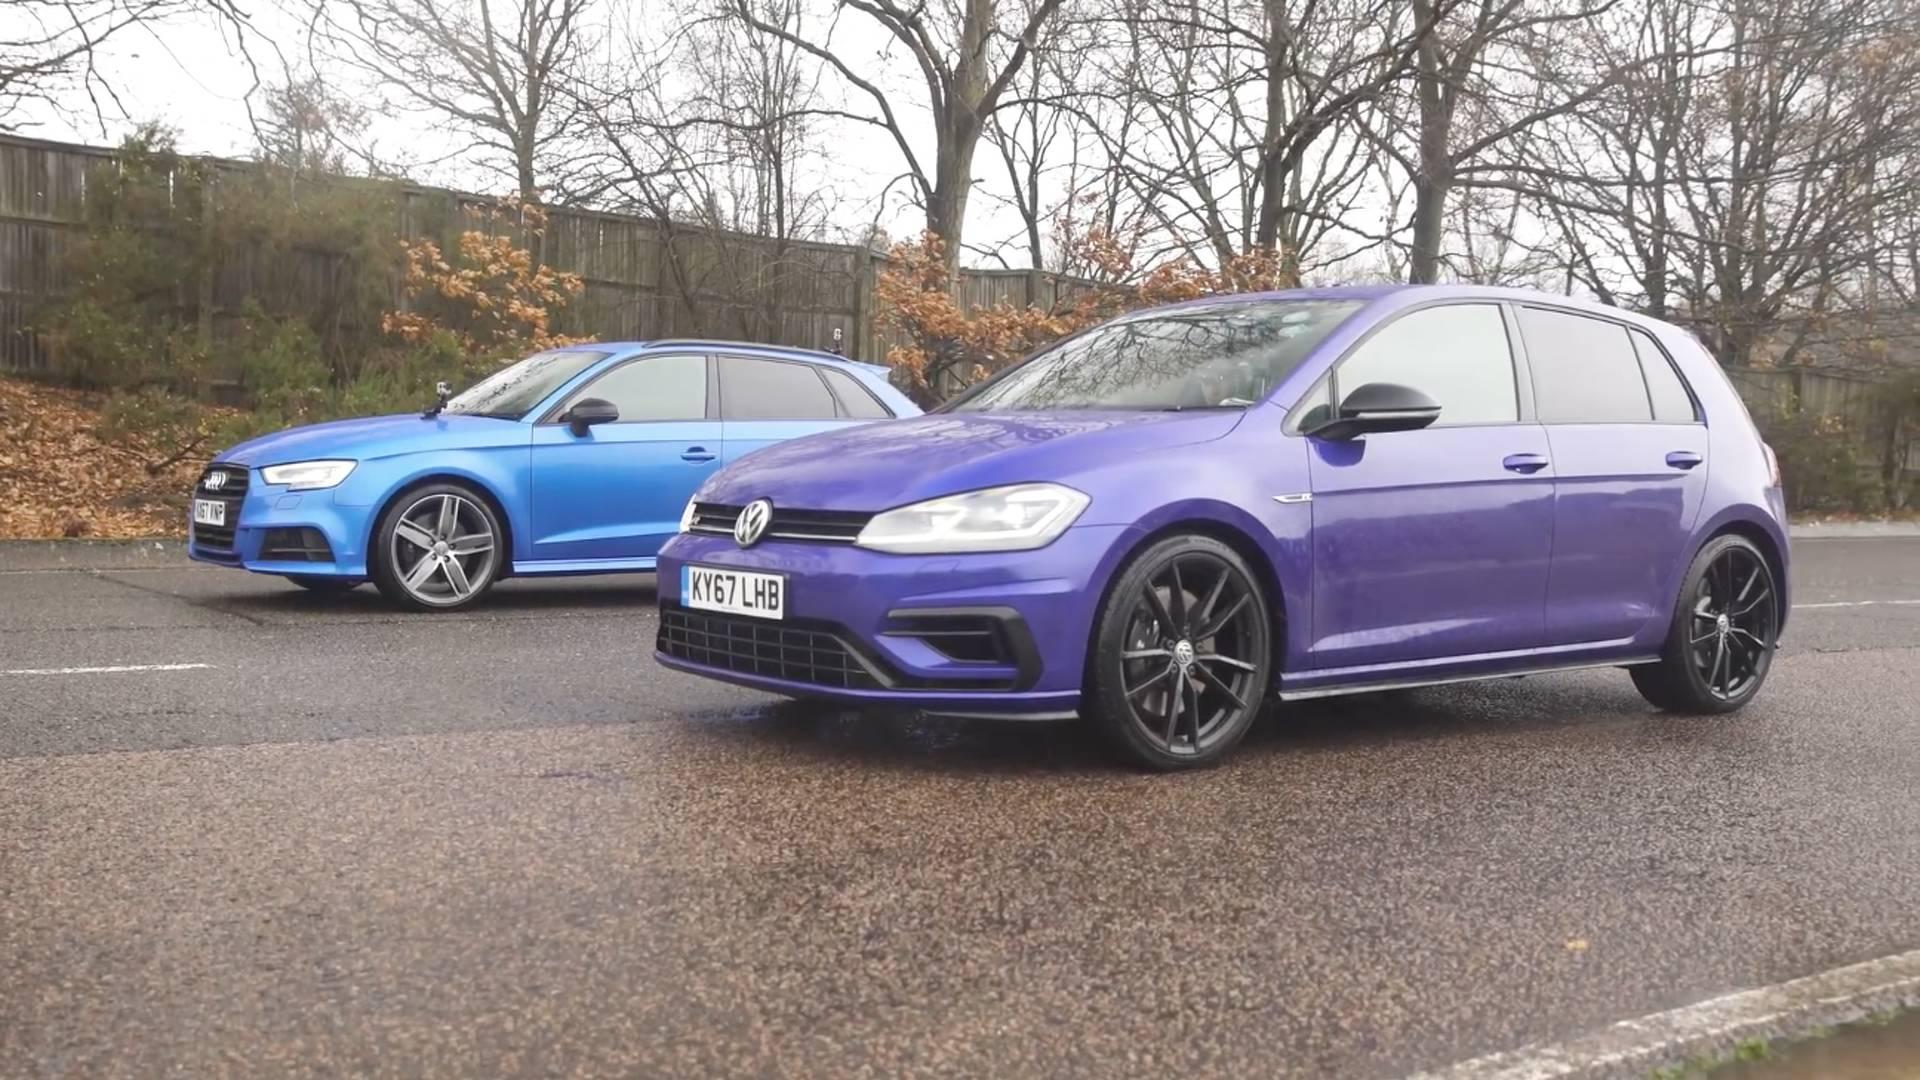 Family Feud Audi S Drag Races VW Golf R - Volkswagen audi